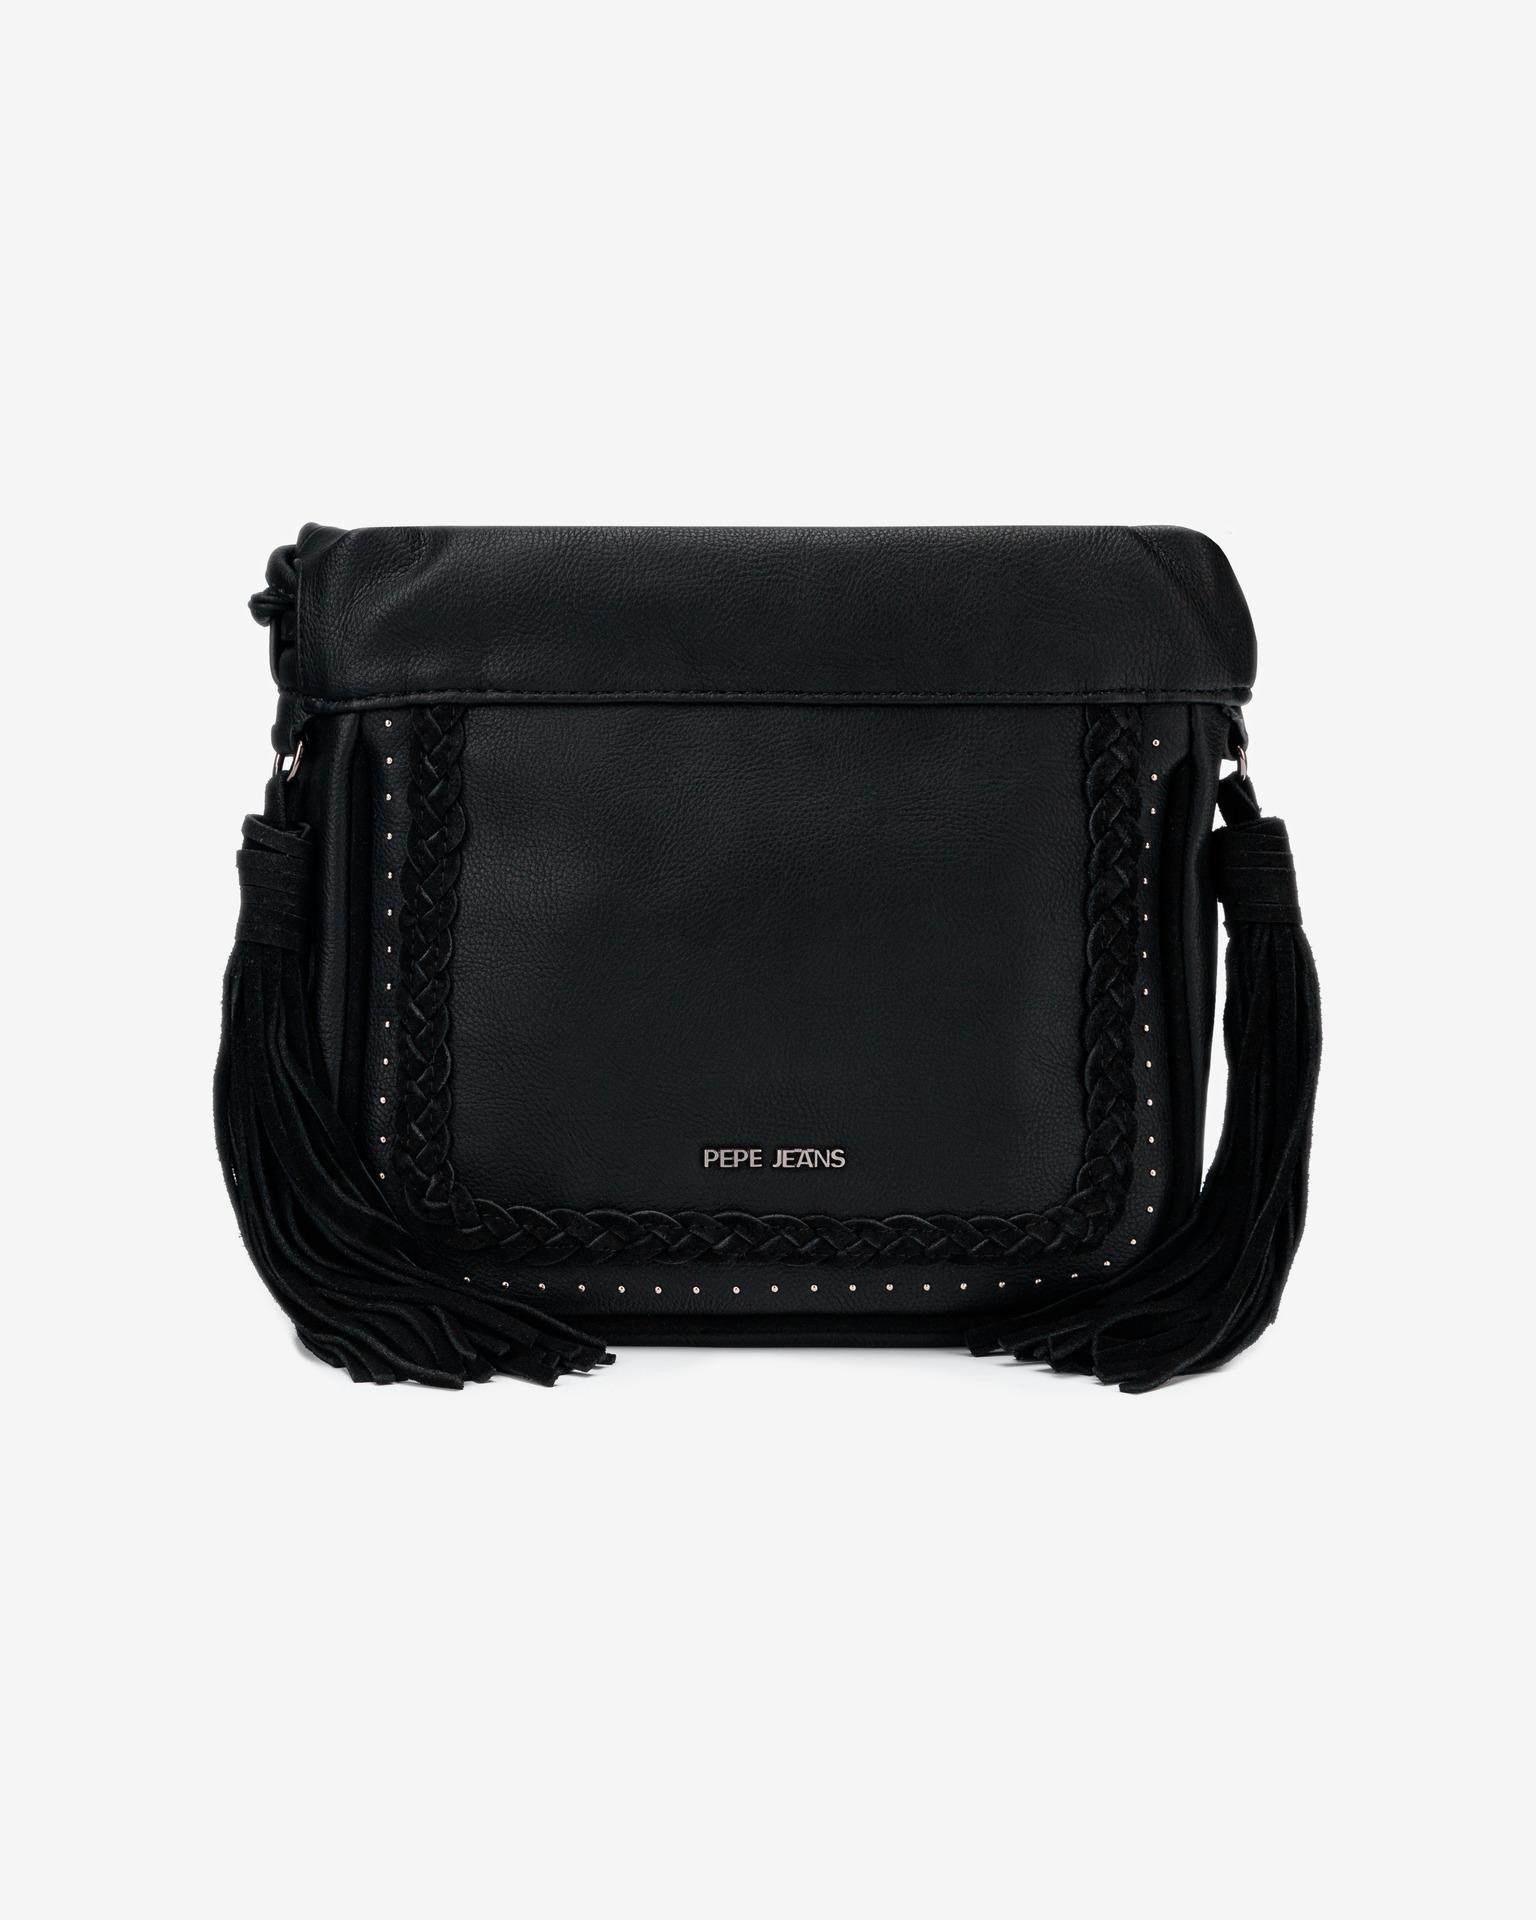 Pepe Jeans Lidia borsa nera